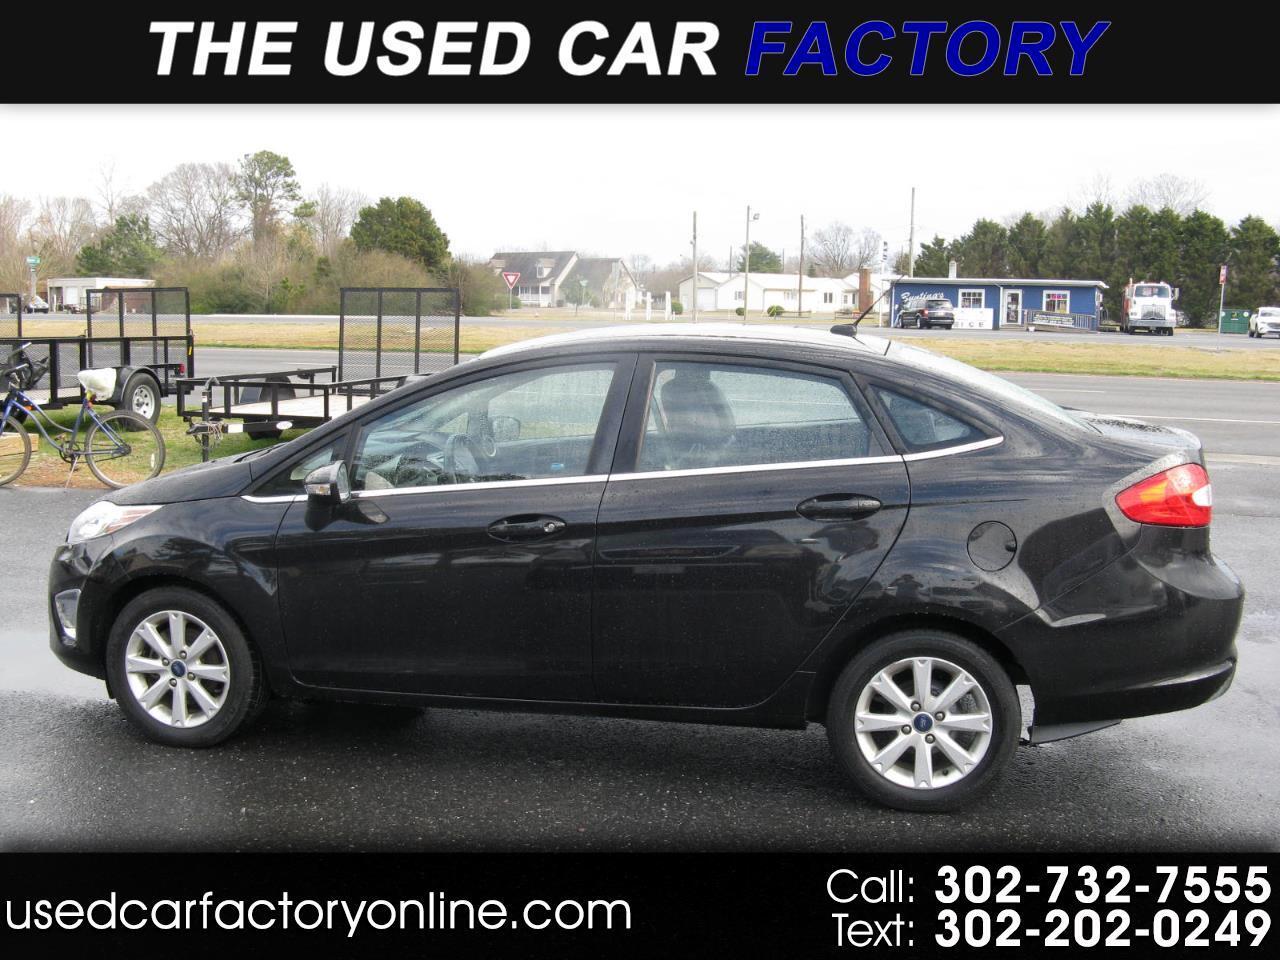 Ford Fiesta SEL Sedan 2011